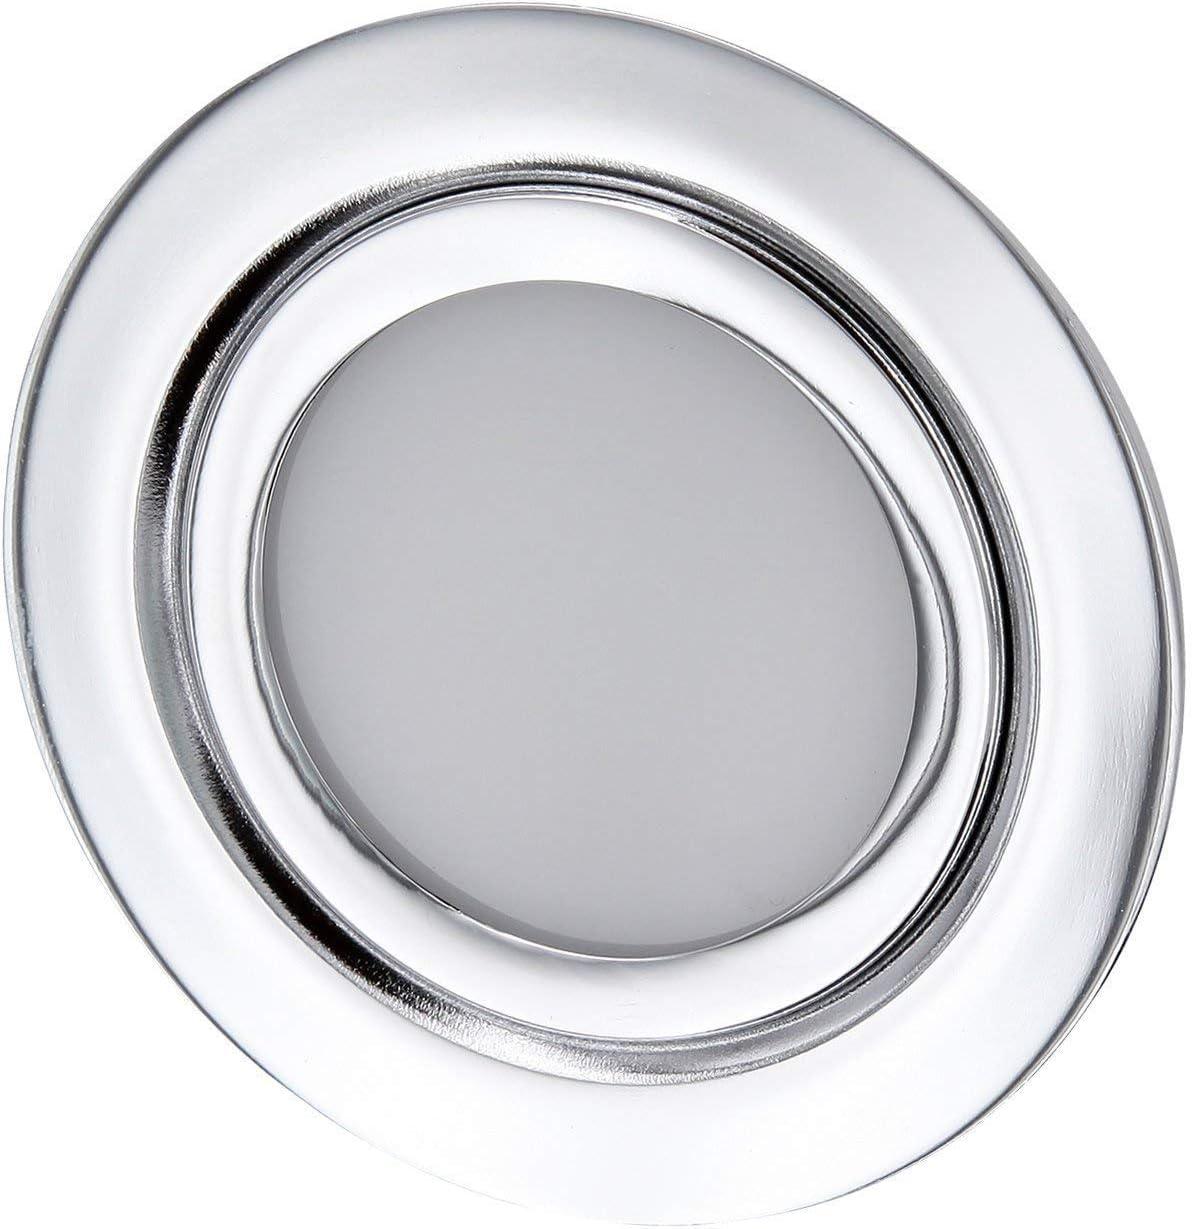 Foco empotrable LED fino para muebles, completo de metal, IP44,12V,adecuado para caja de 60mm de diámetro,blanco diurno (4000K)